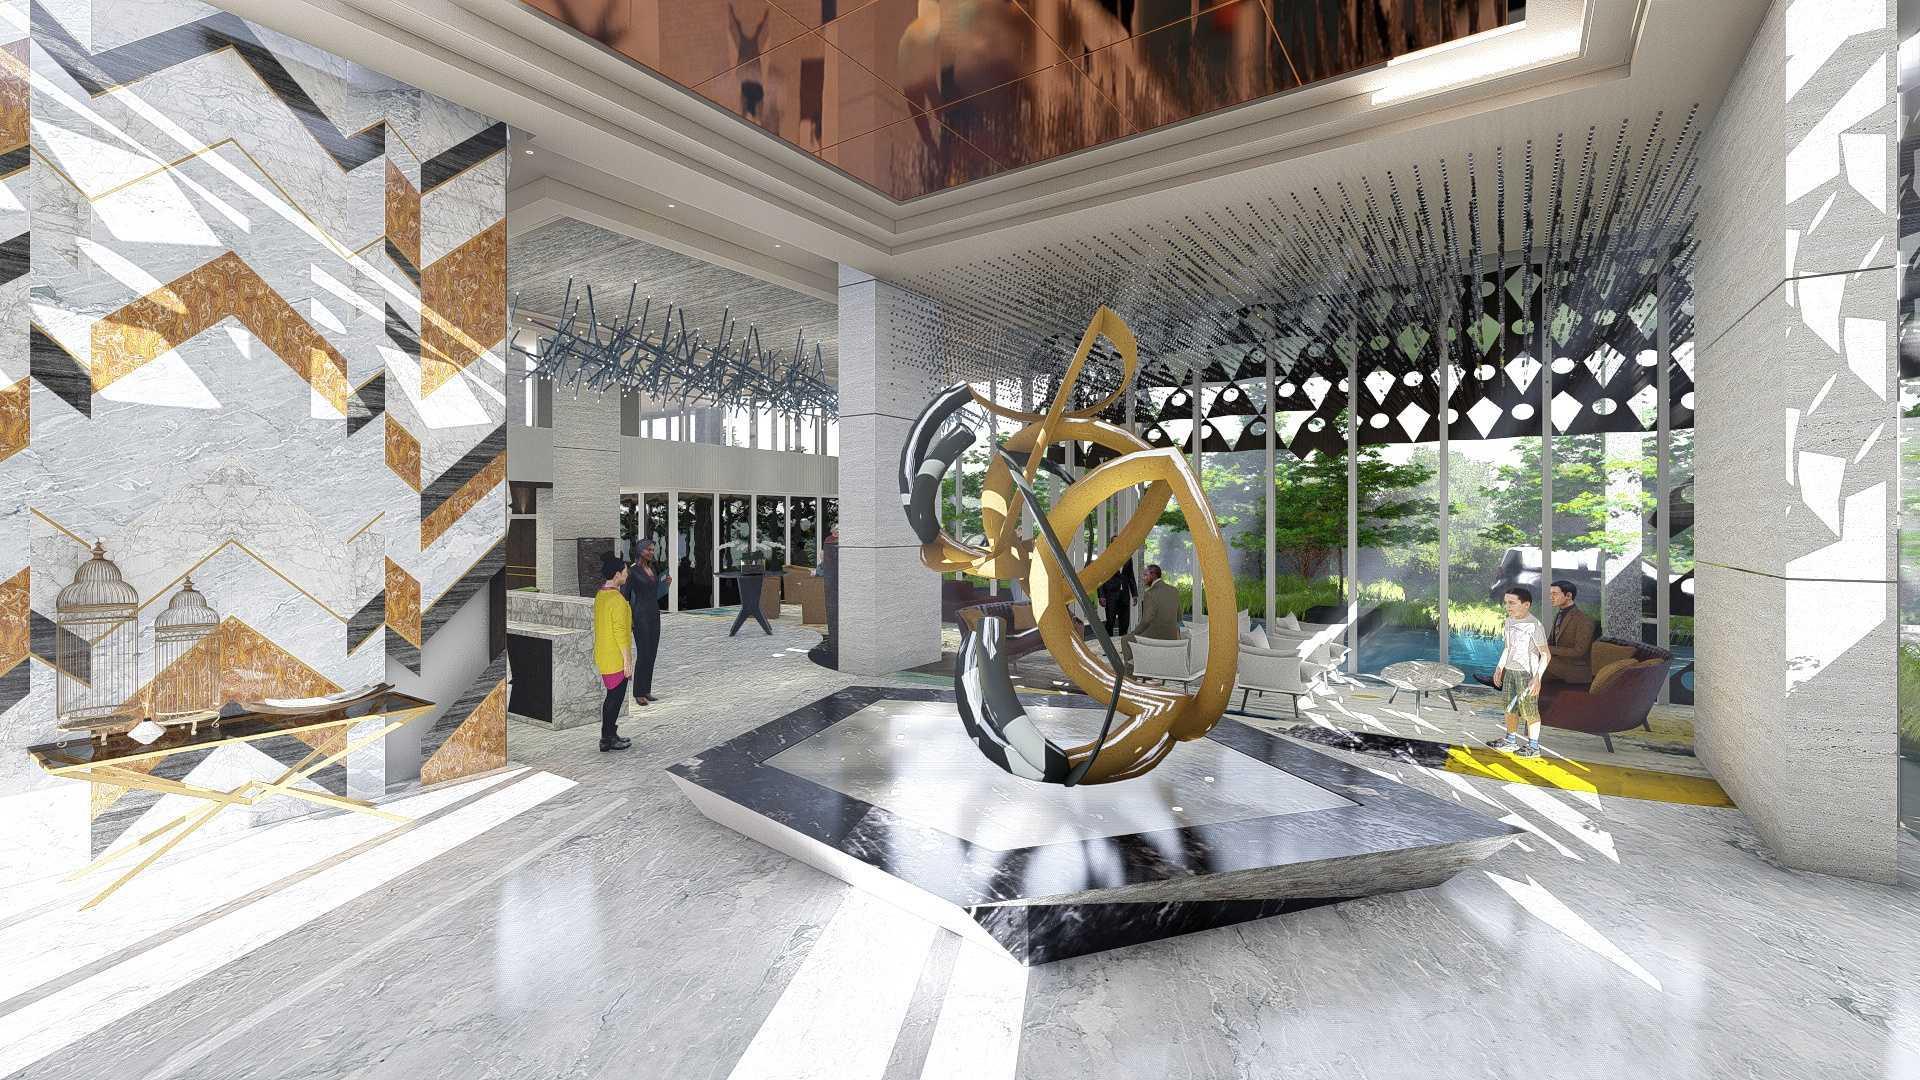 Samitrayasa Design Luxury Design Alternative 1 Jl. Kemang Raya, Bangka, Mampang Prpt., Kota Jakarta Selatan, Daerah Khusus Ibukota Jakarta, Indonesia  101   32645